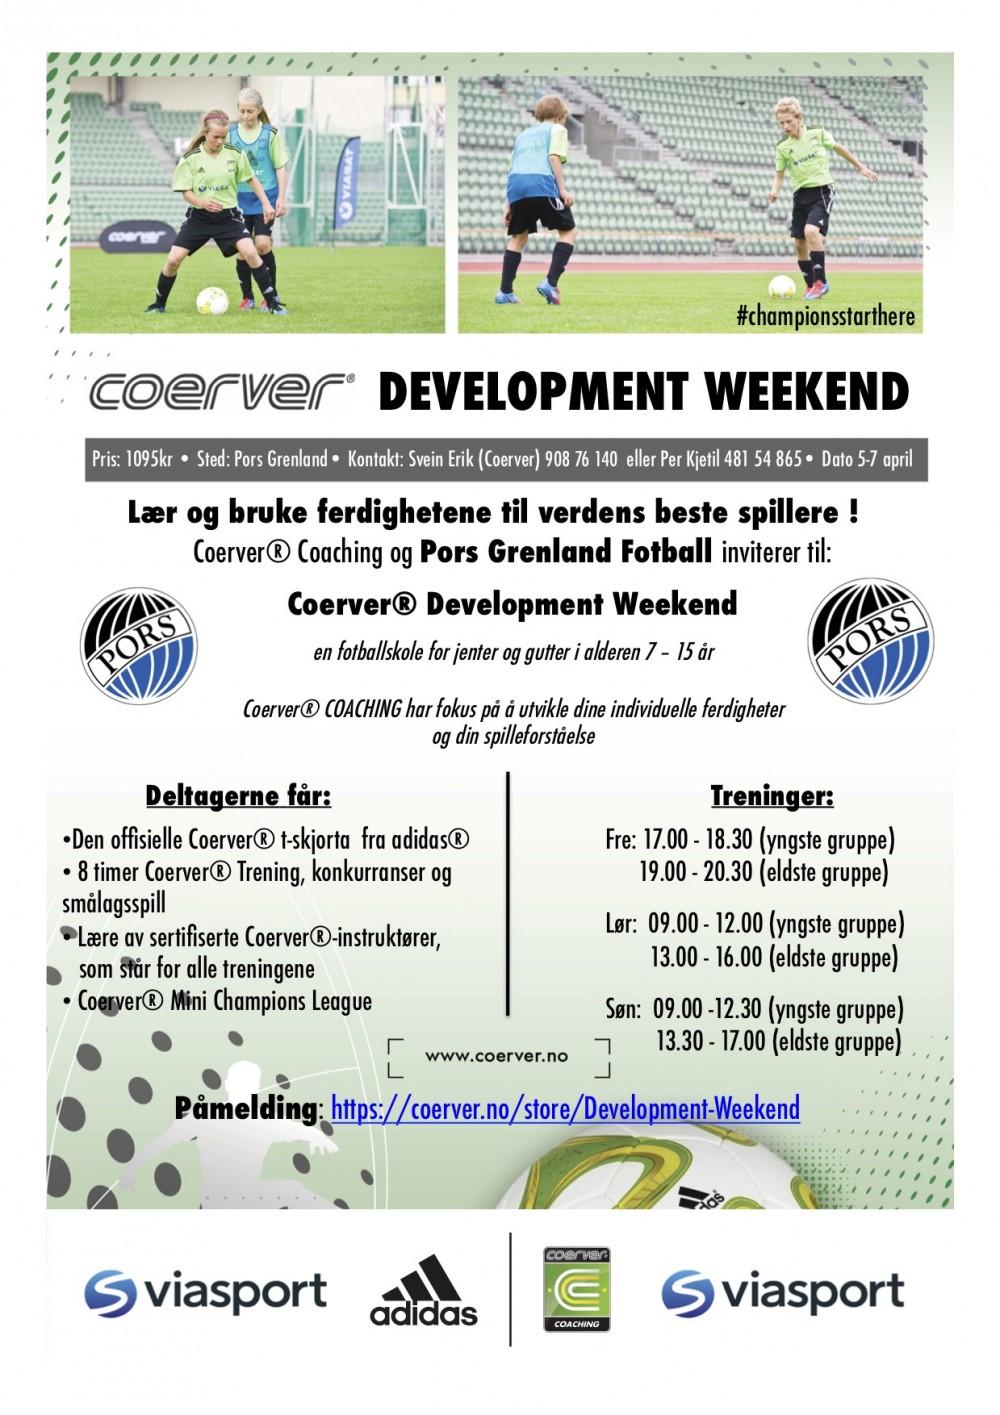 Coerver Development Weekend hos Pors Grenland Fotball 5-7 april